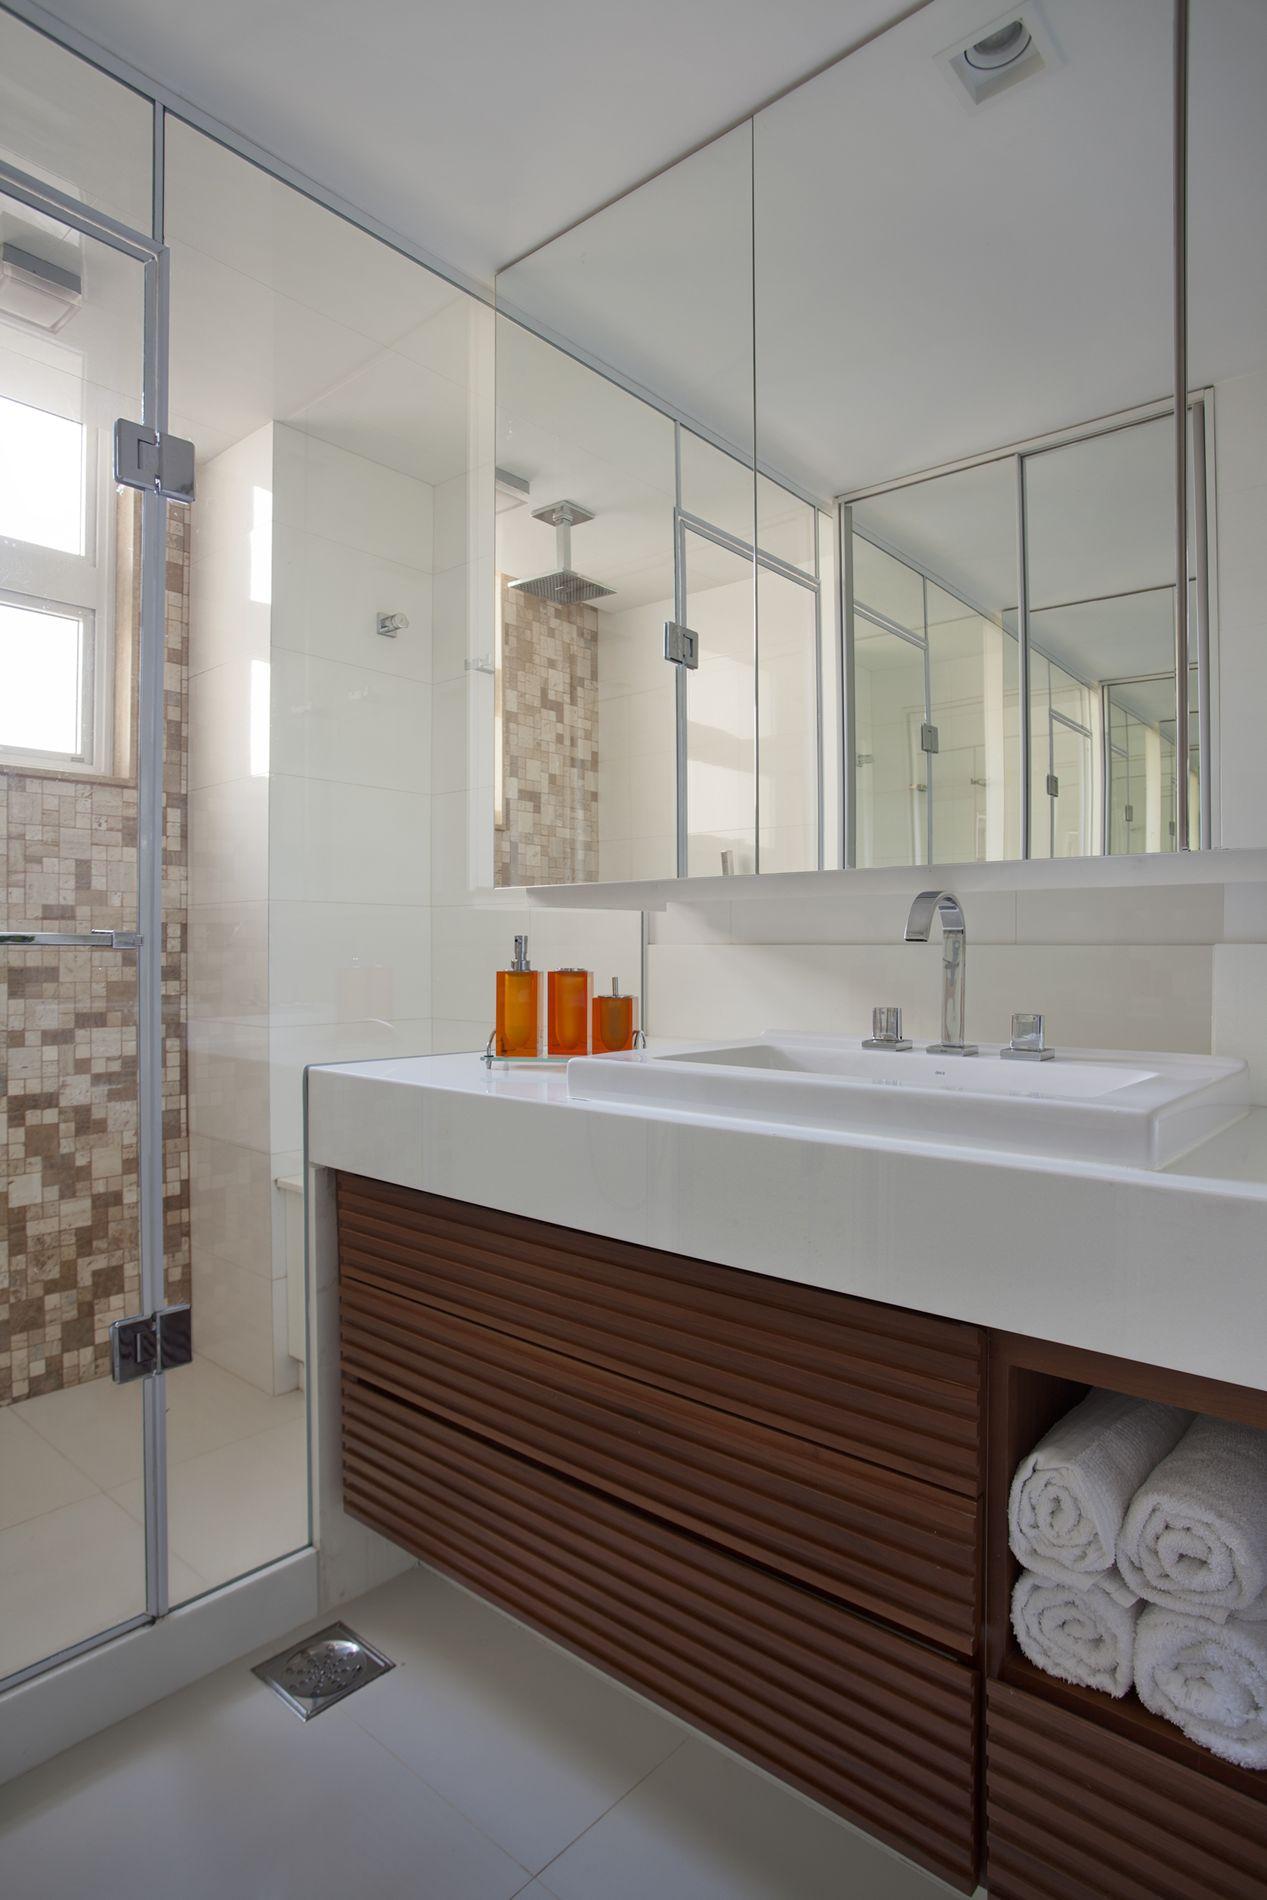 banheiros banheiros banheiros banheiros banheiros banheiros banheiros  #3A261E 1267 1900